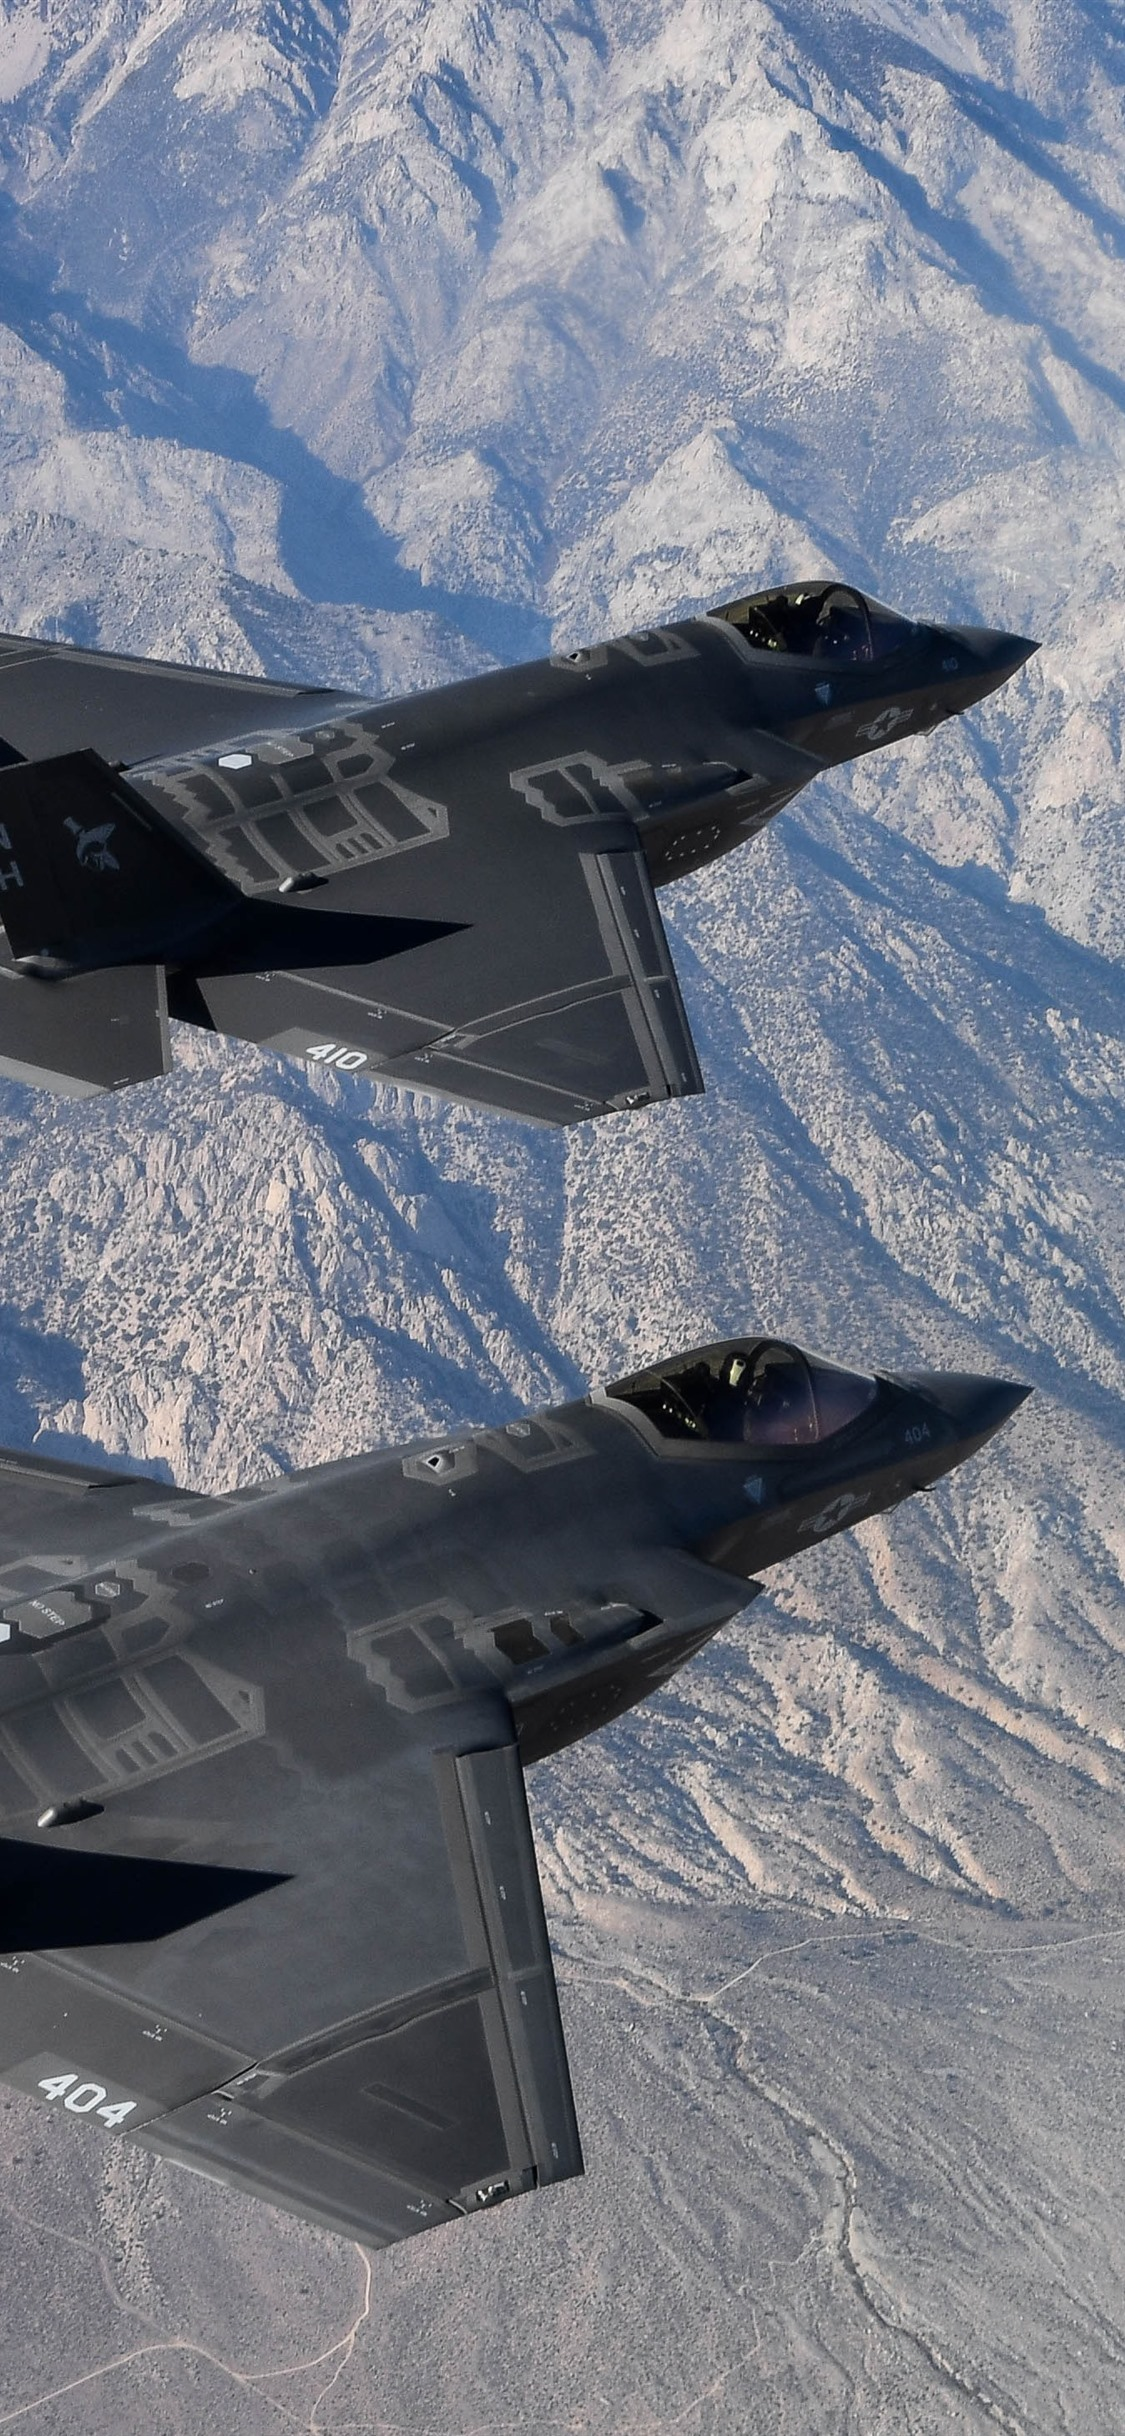 F 21C Lightning II fighter, flight 21x21 iPhone 21 Pro/XS Max ...